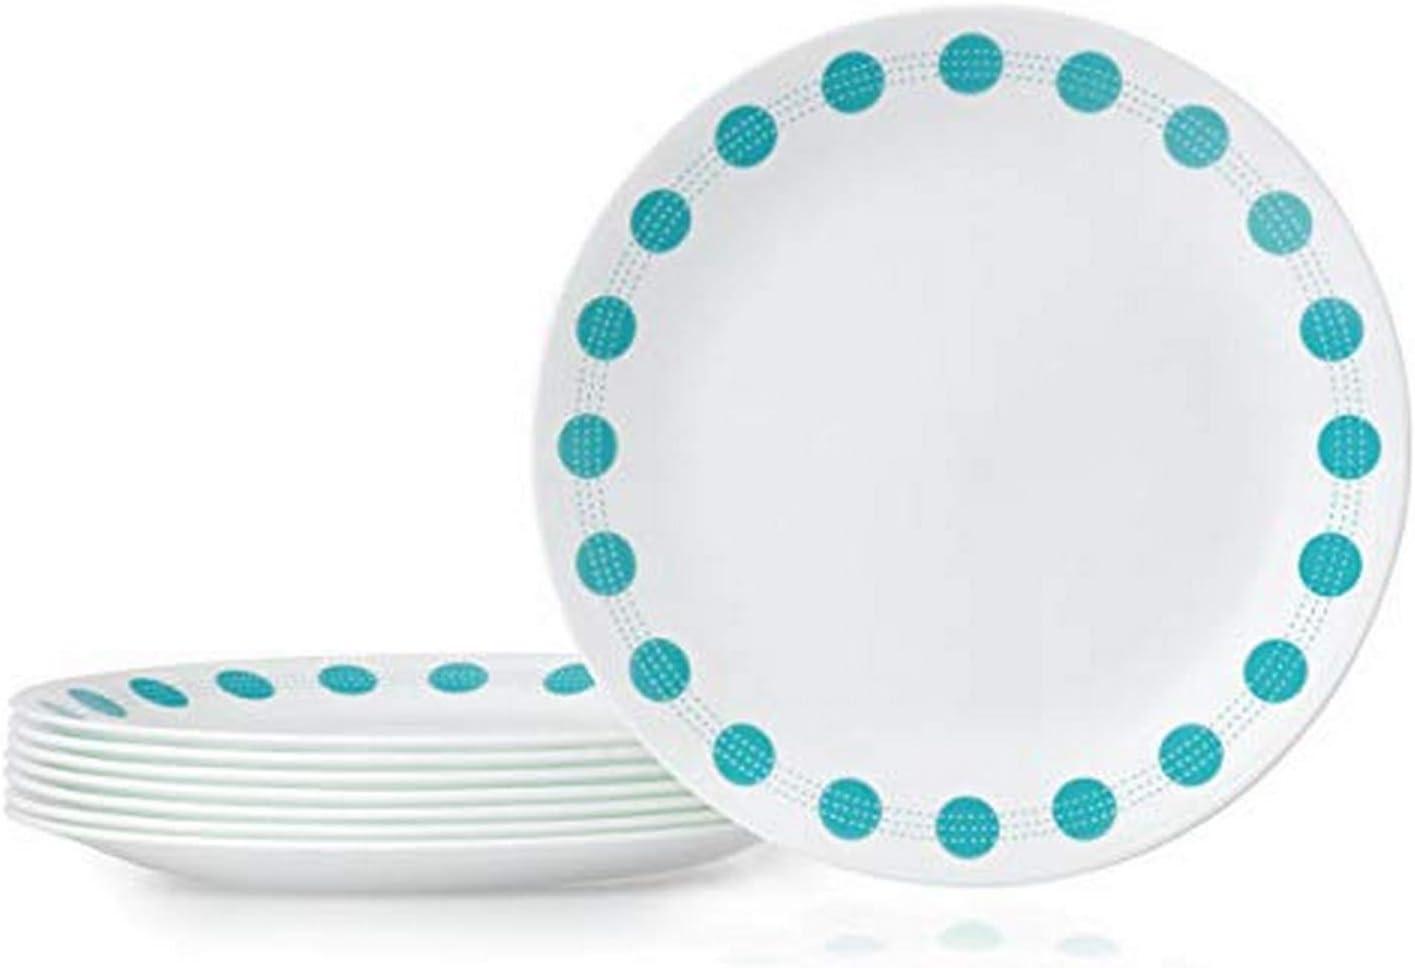 Corelle Dinner Plates, 8-Piece, South Beach